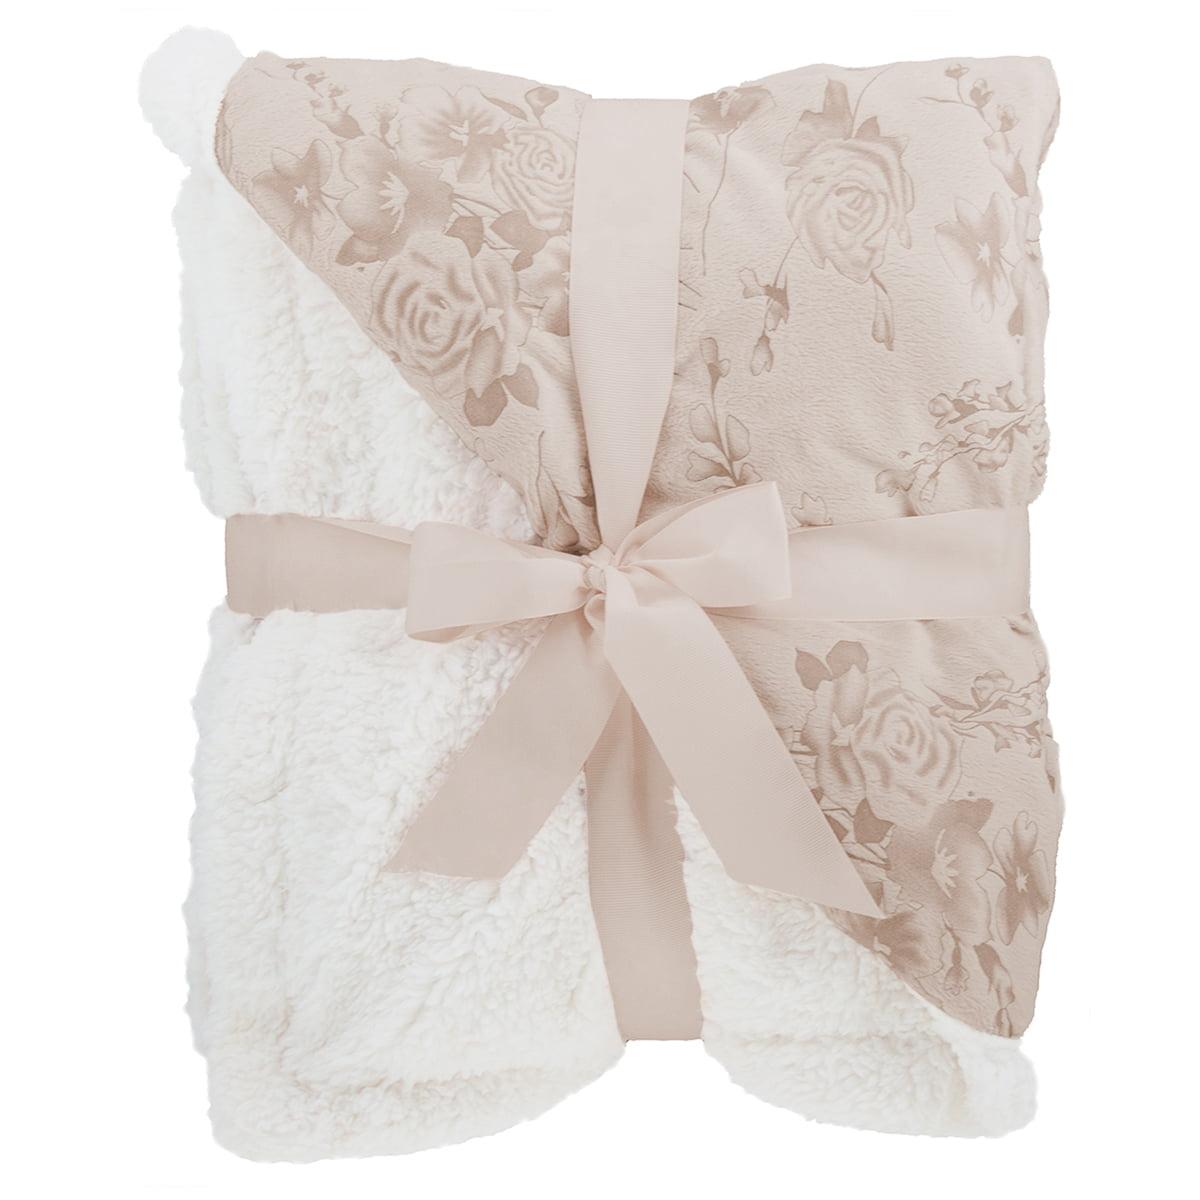 "Sherpa Throw Blanket 50"" x 60"" Plush Fleece Reversible Floral Pattern Fuzzy Soft"